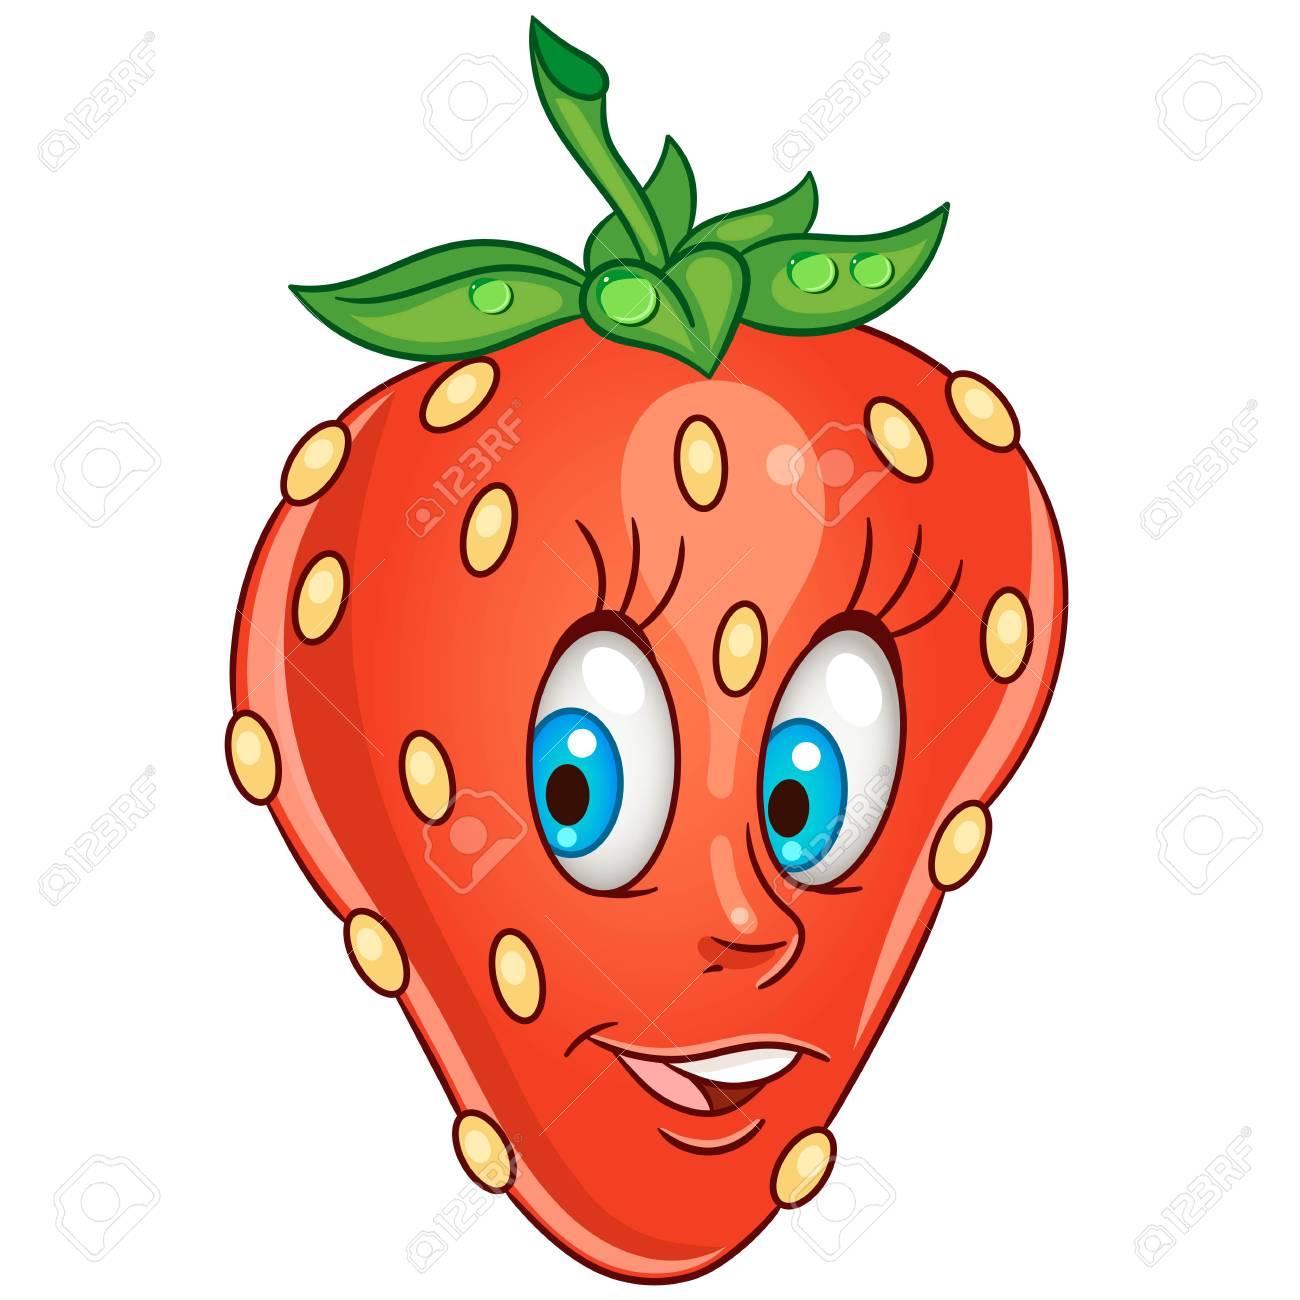 Icono De Dibujos Animados Fresa Carácter De Frutas Para Colorear